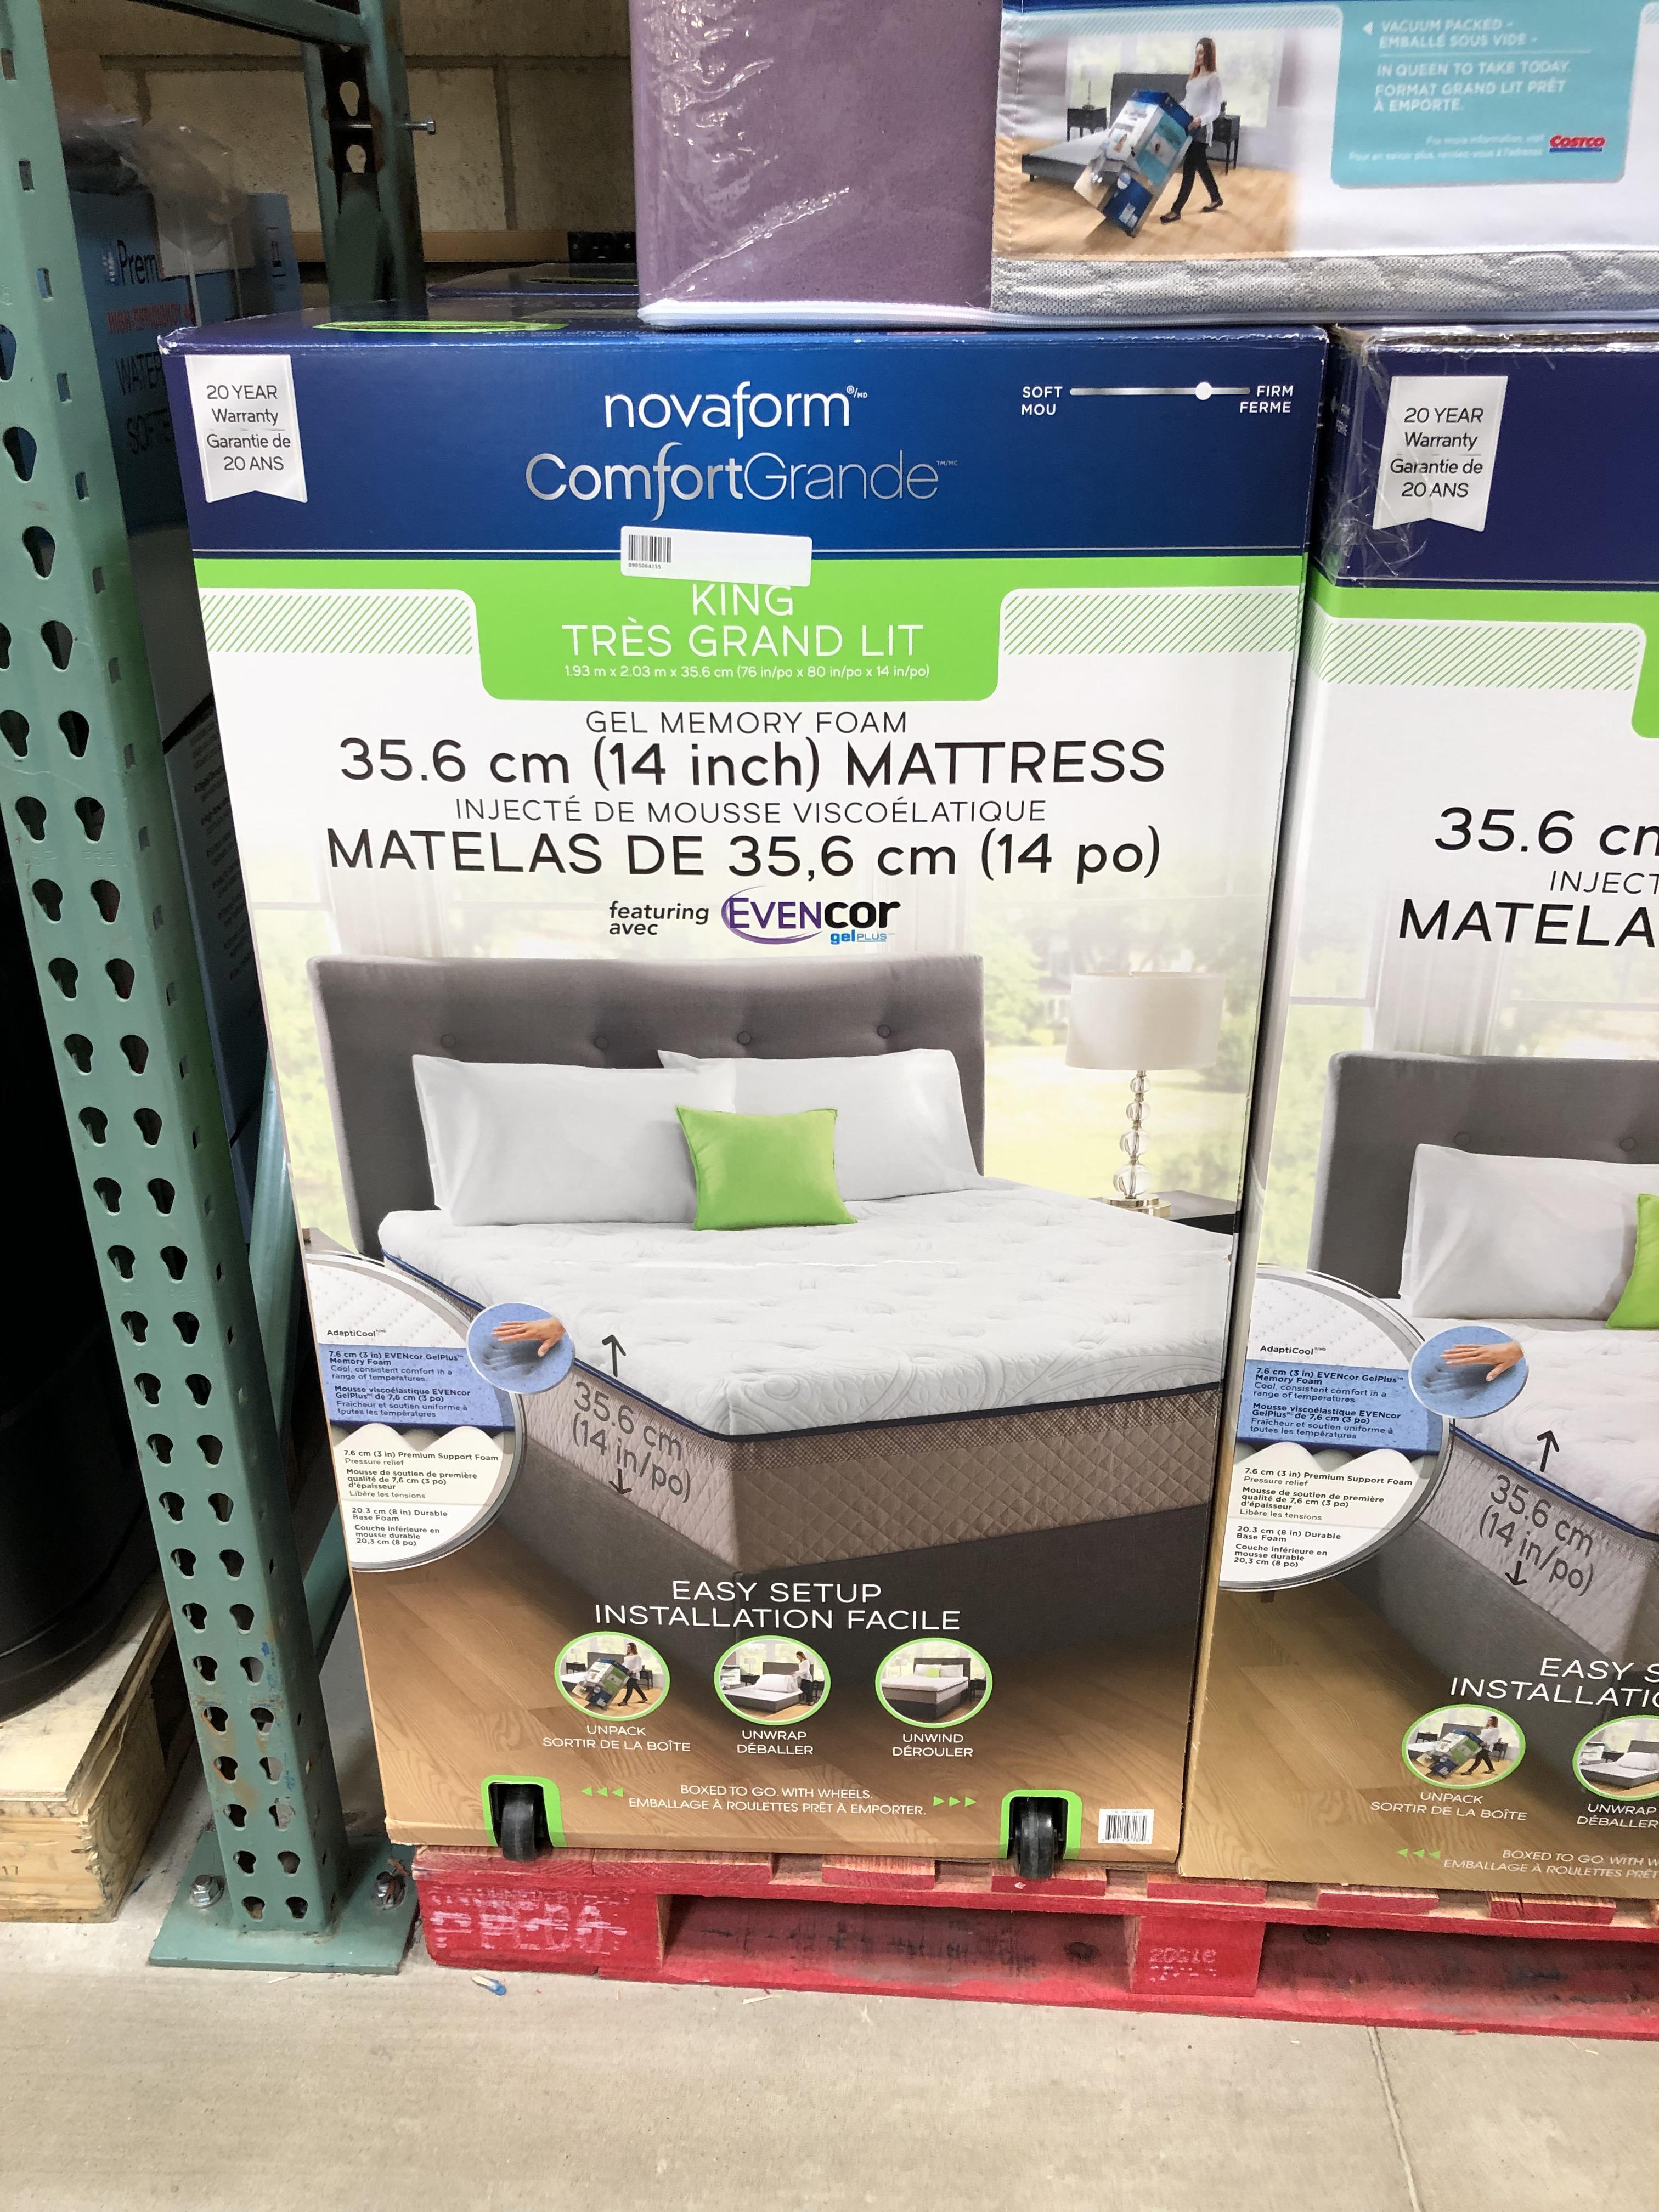 novaform mattress looking